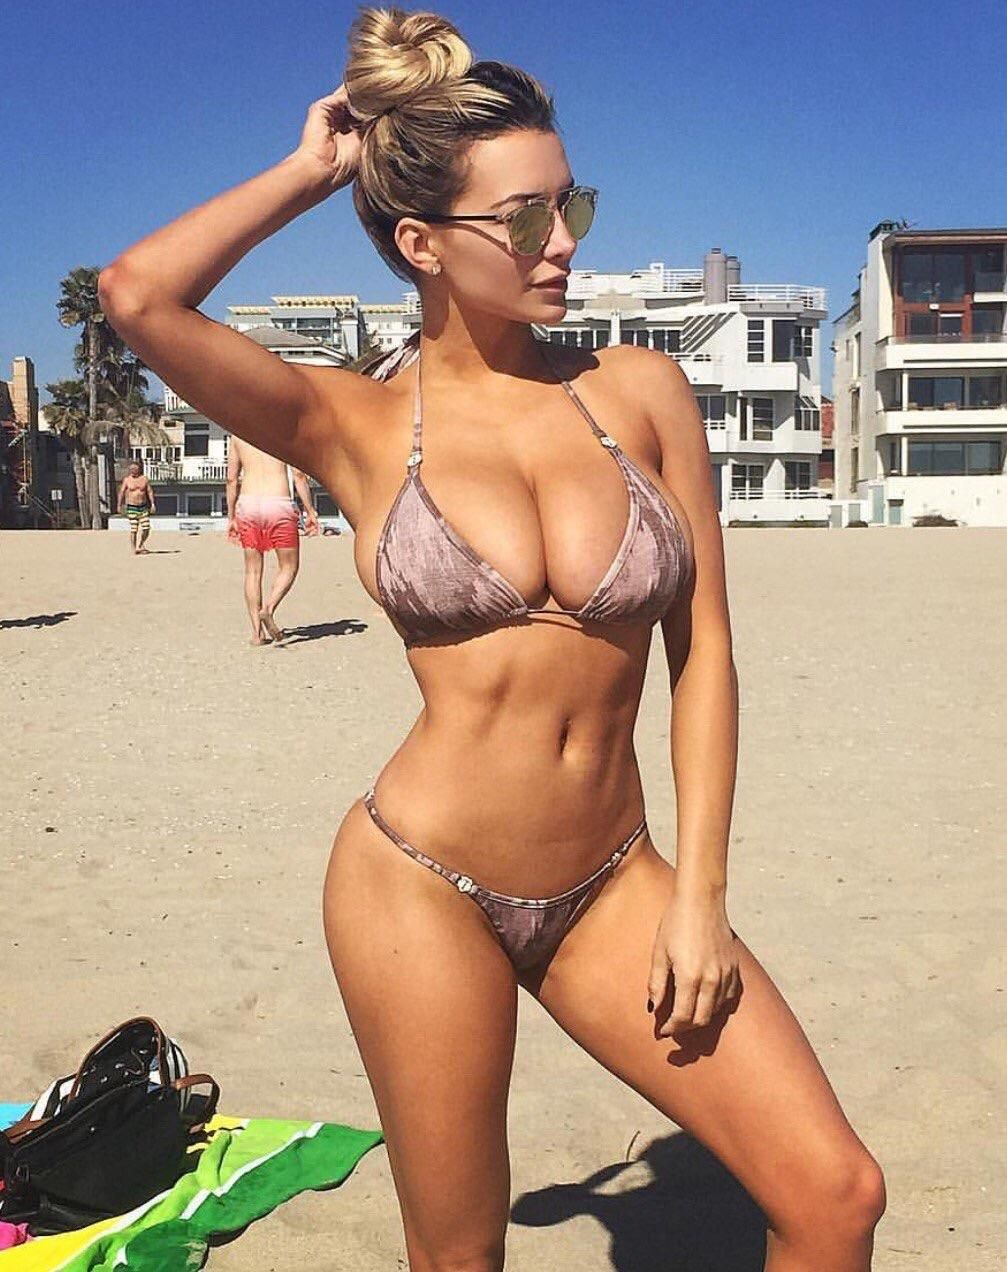 lindsey pelas | girl | pinterest | girls, swimsuits and bikini girls